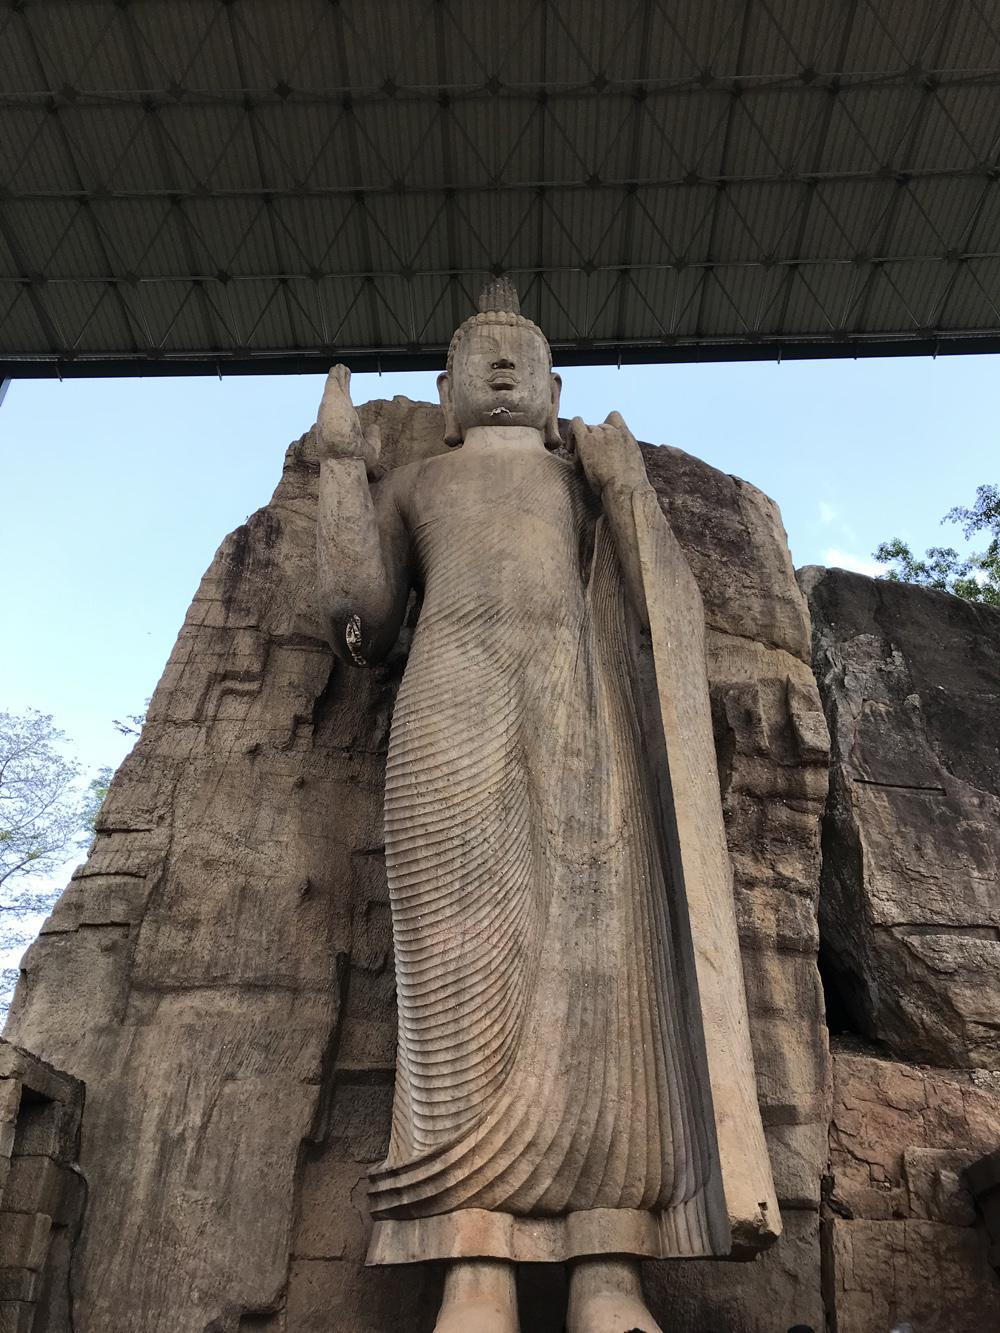 Sri Lanka Awukana Statue Bouddha